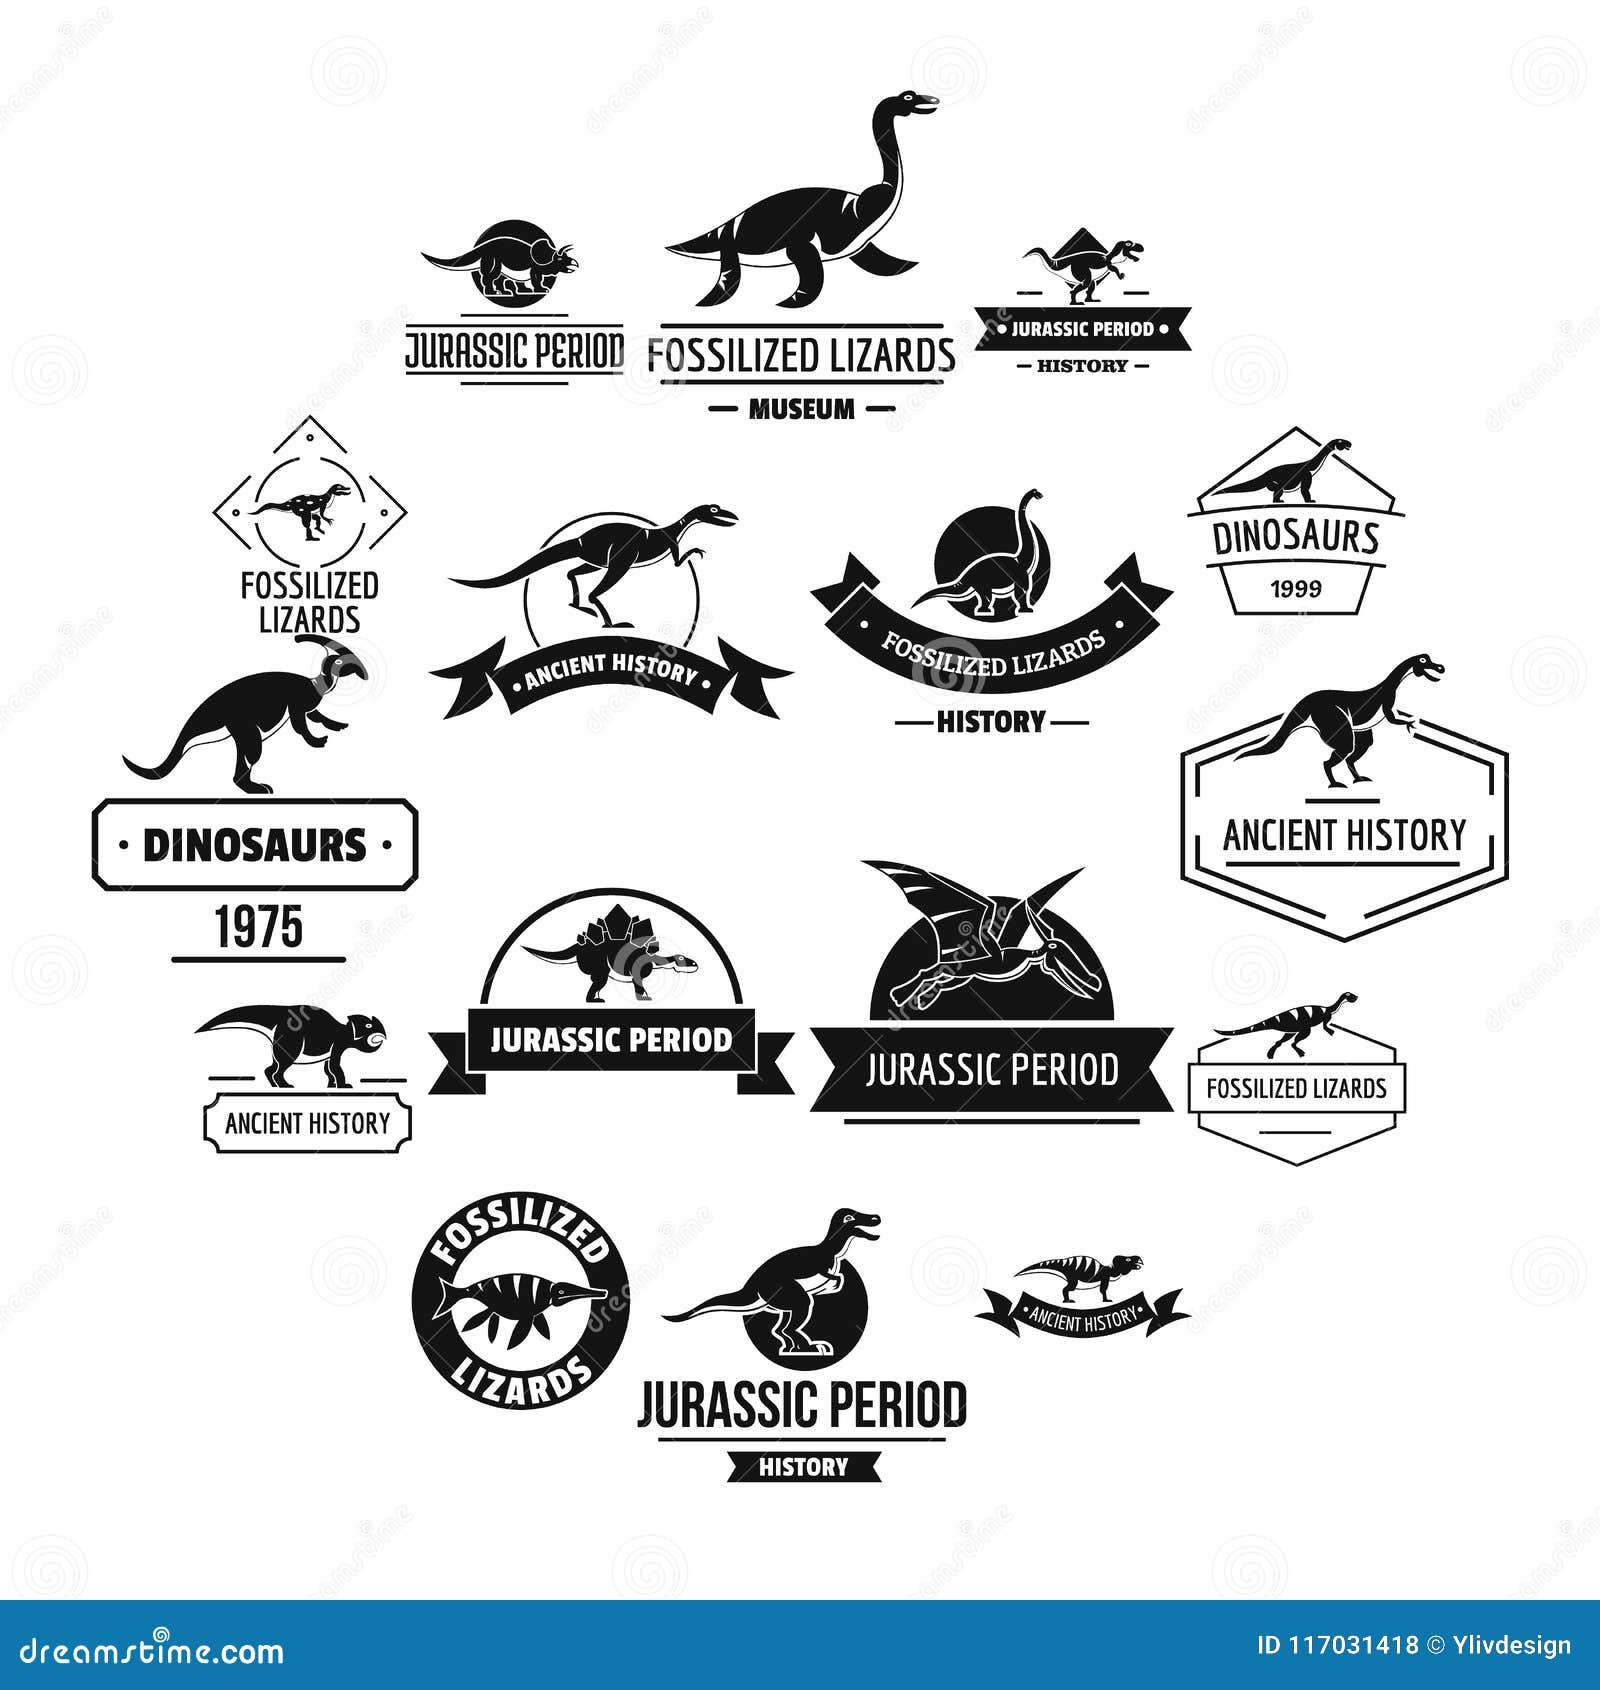 ccfdef38010d9 Dinosaur Logo Icons Set, Simple Style Stock Vector - Illustration of ...